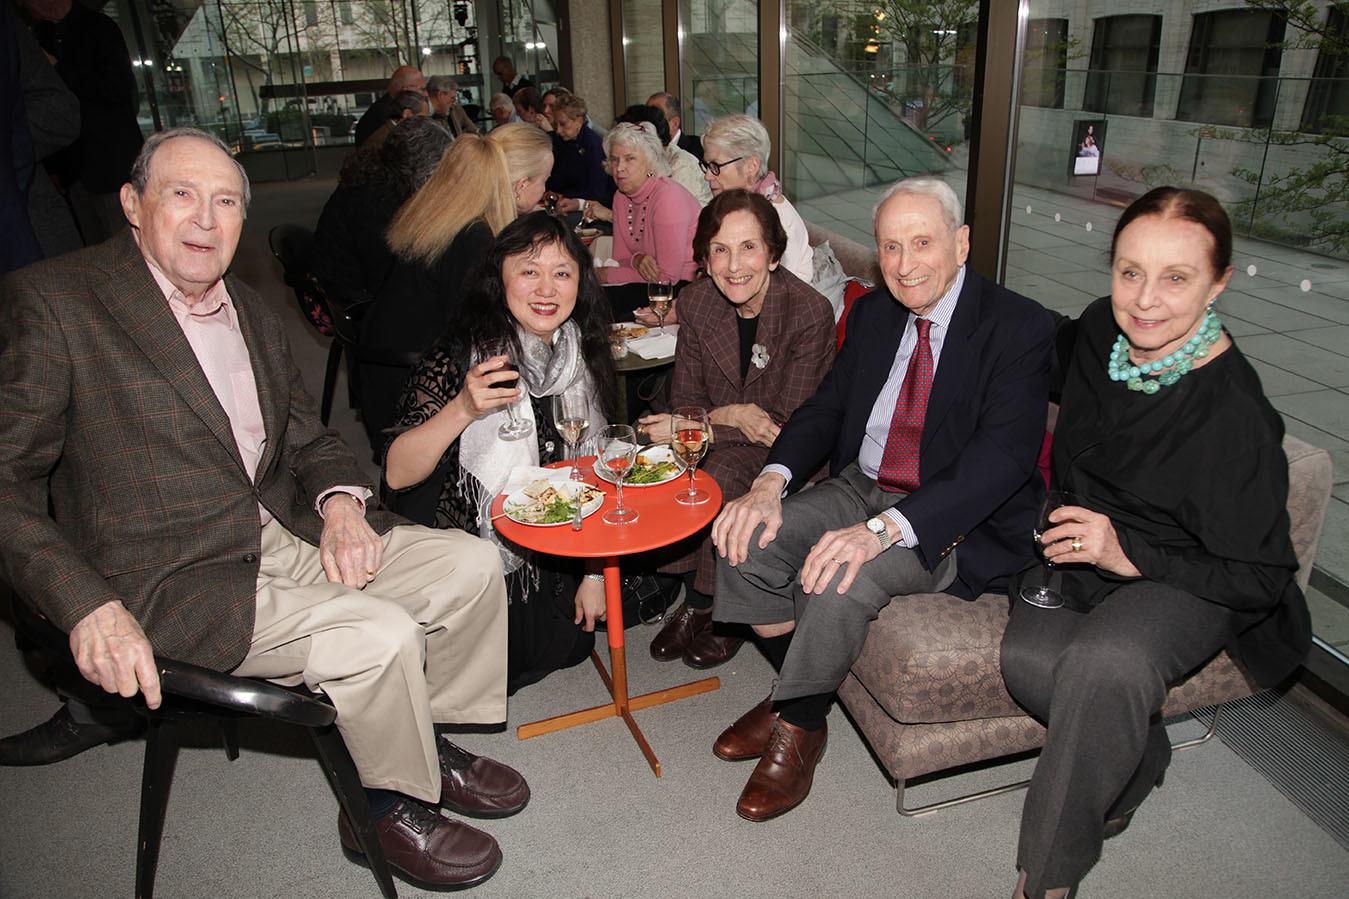 Gus Hauser, Wu Han, Rita Hauser, CMS Board member Herbert Schlosser, Judith Schlosser